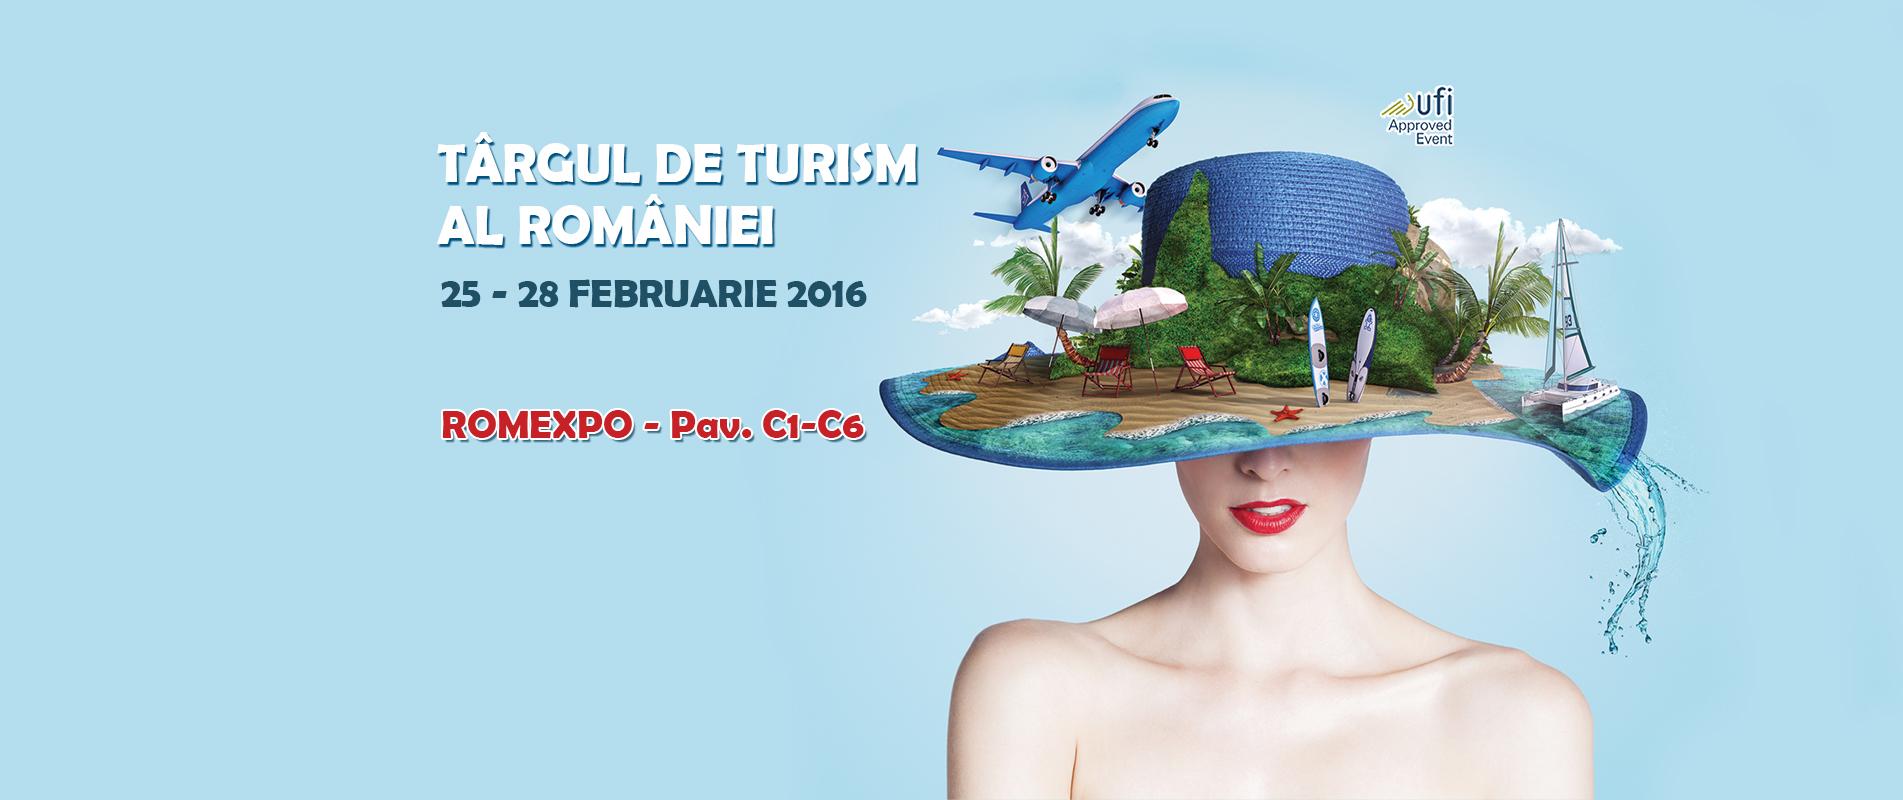 Romania Tourism Fair Opens Its Doors